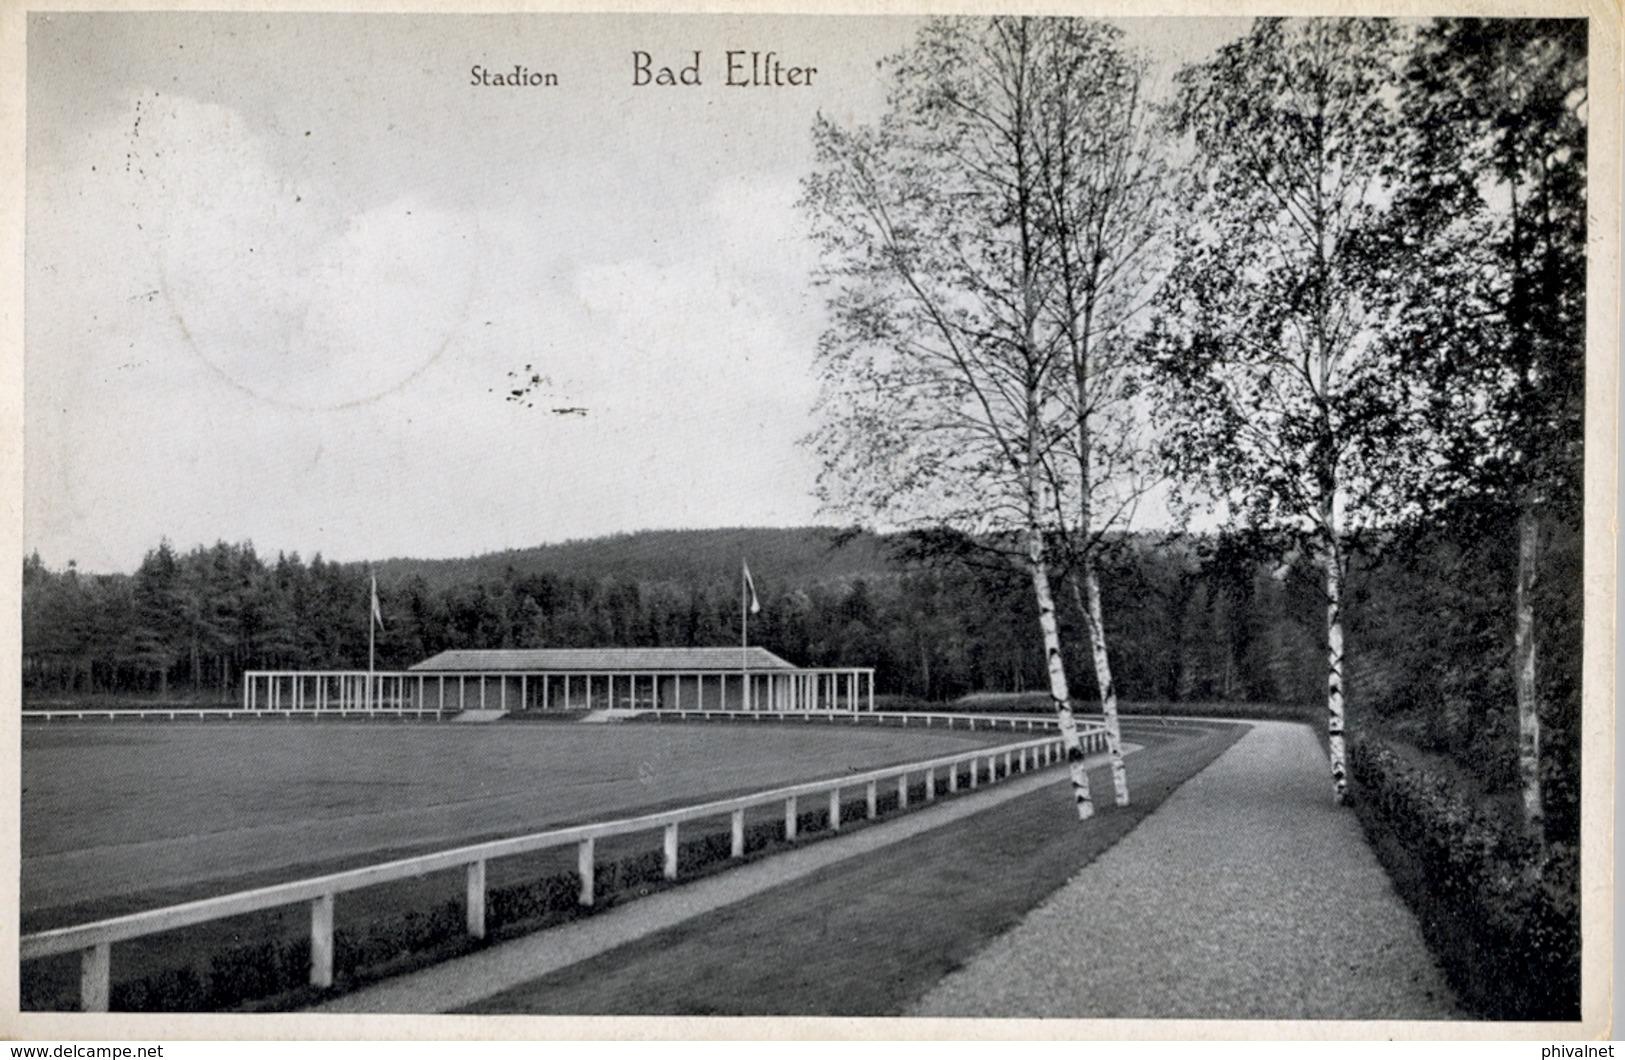 1934 ALEMANIA , TARJETA POSTAL CIRCULADA, BAD ELSTER , ESTADIO , STADION , STADIUM - Estadios